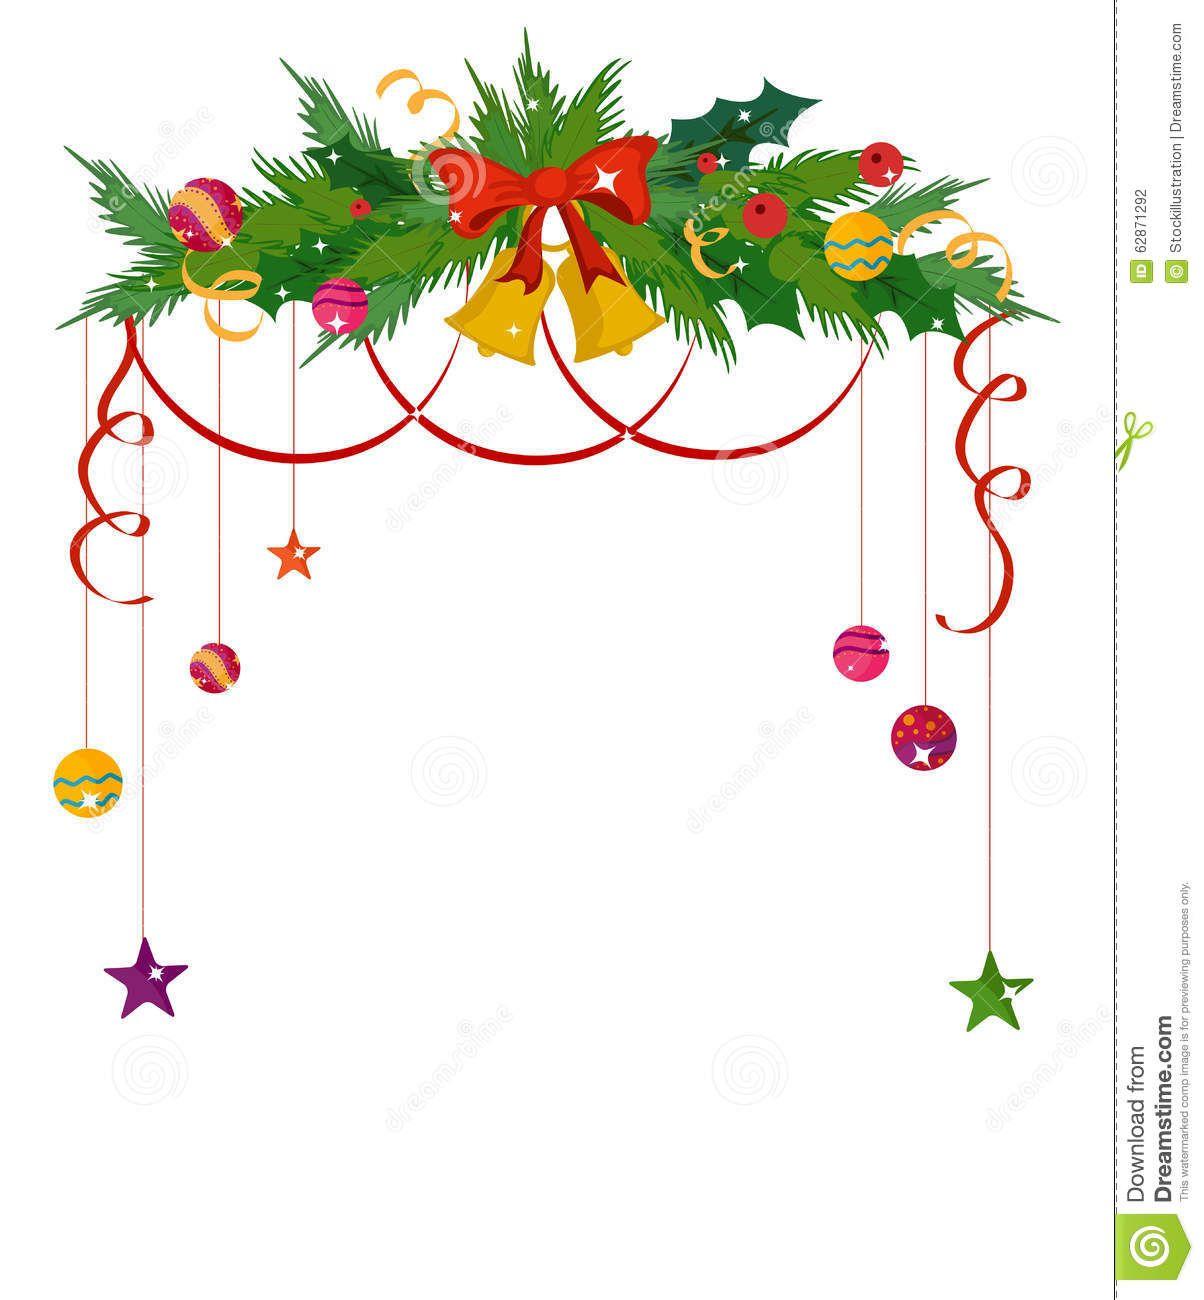 merry christmas border and decoration frame stock vector image rh pinterest com au christmas border vector free christmas border vector designs